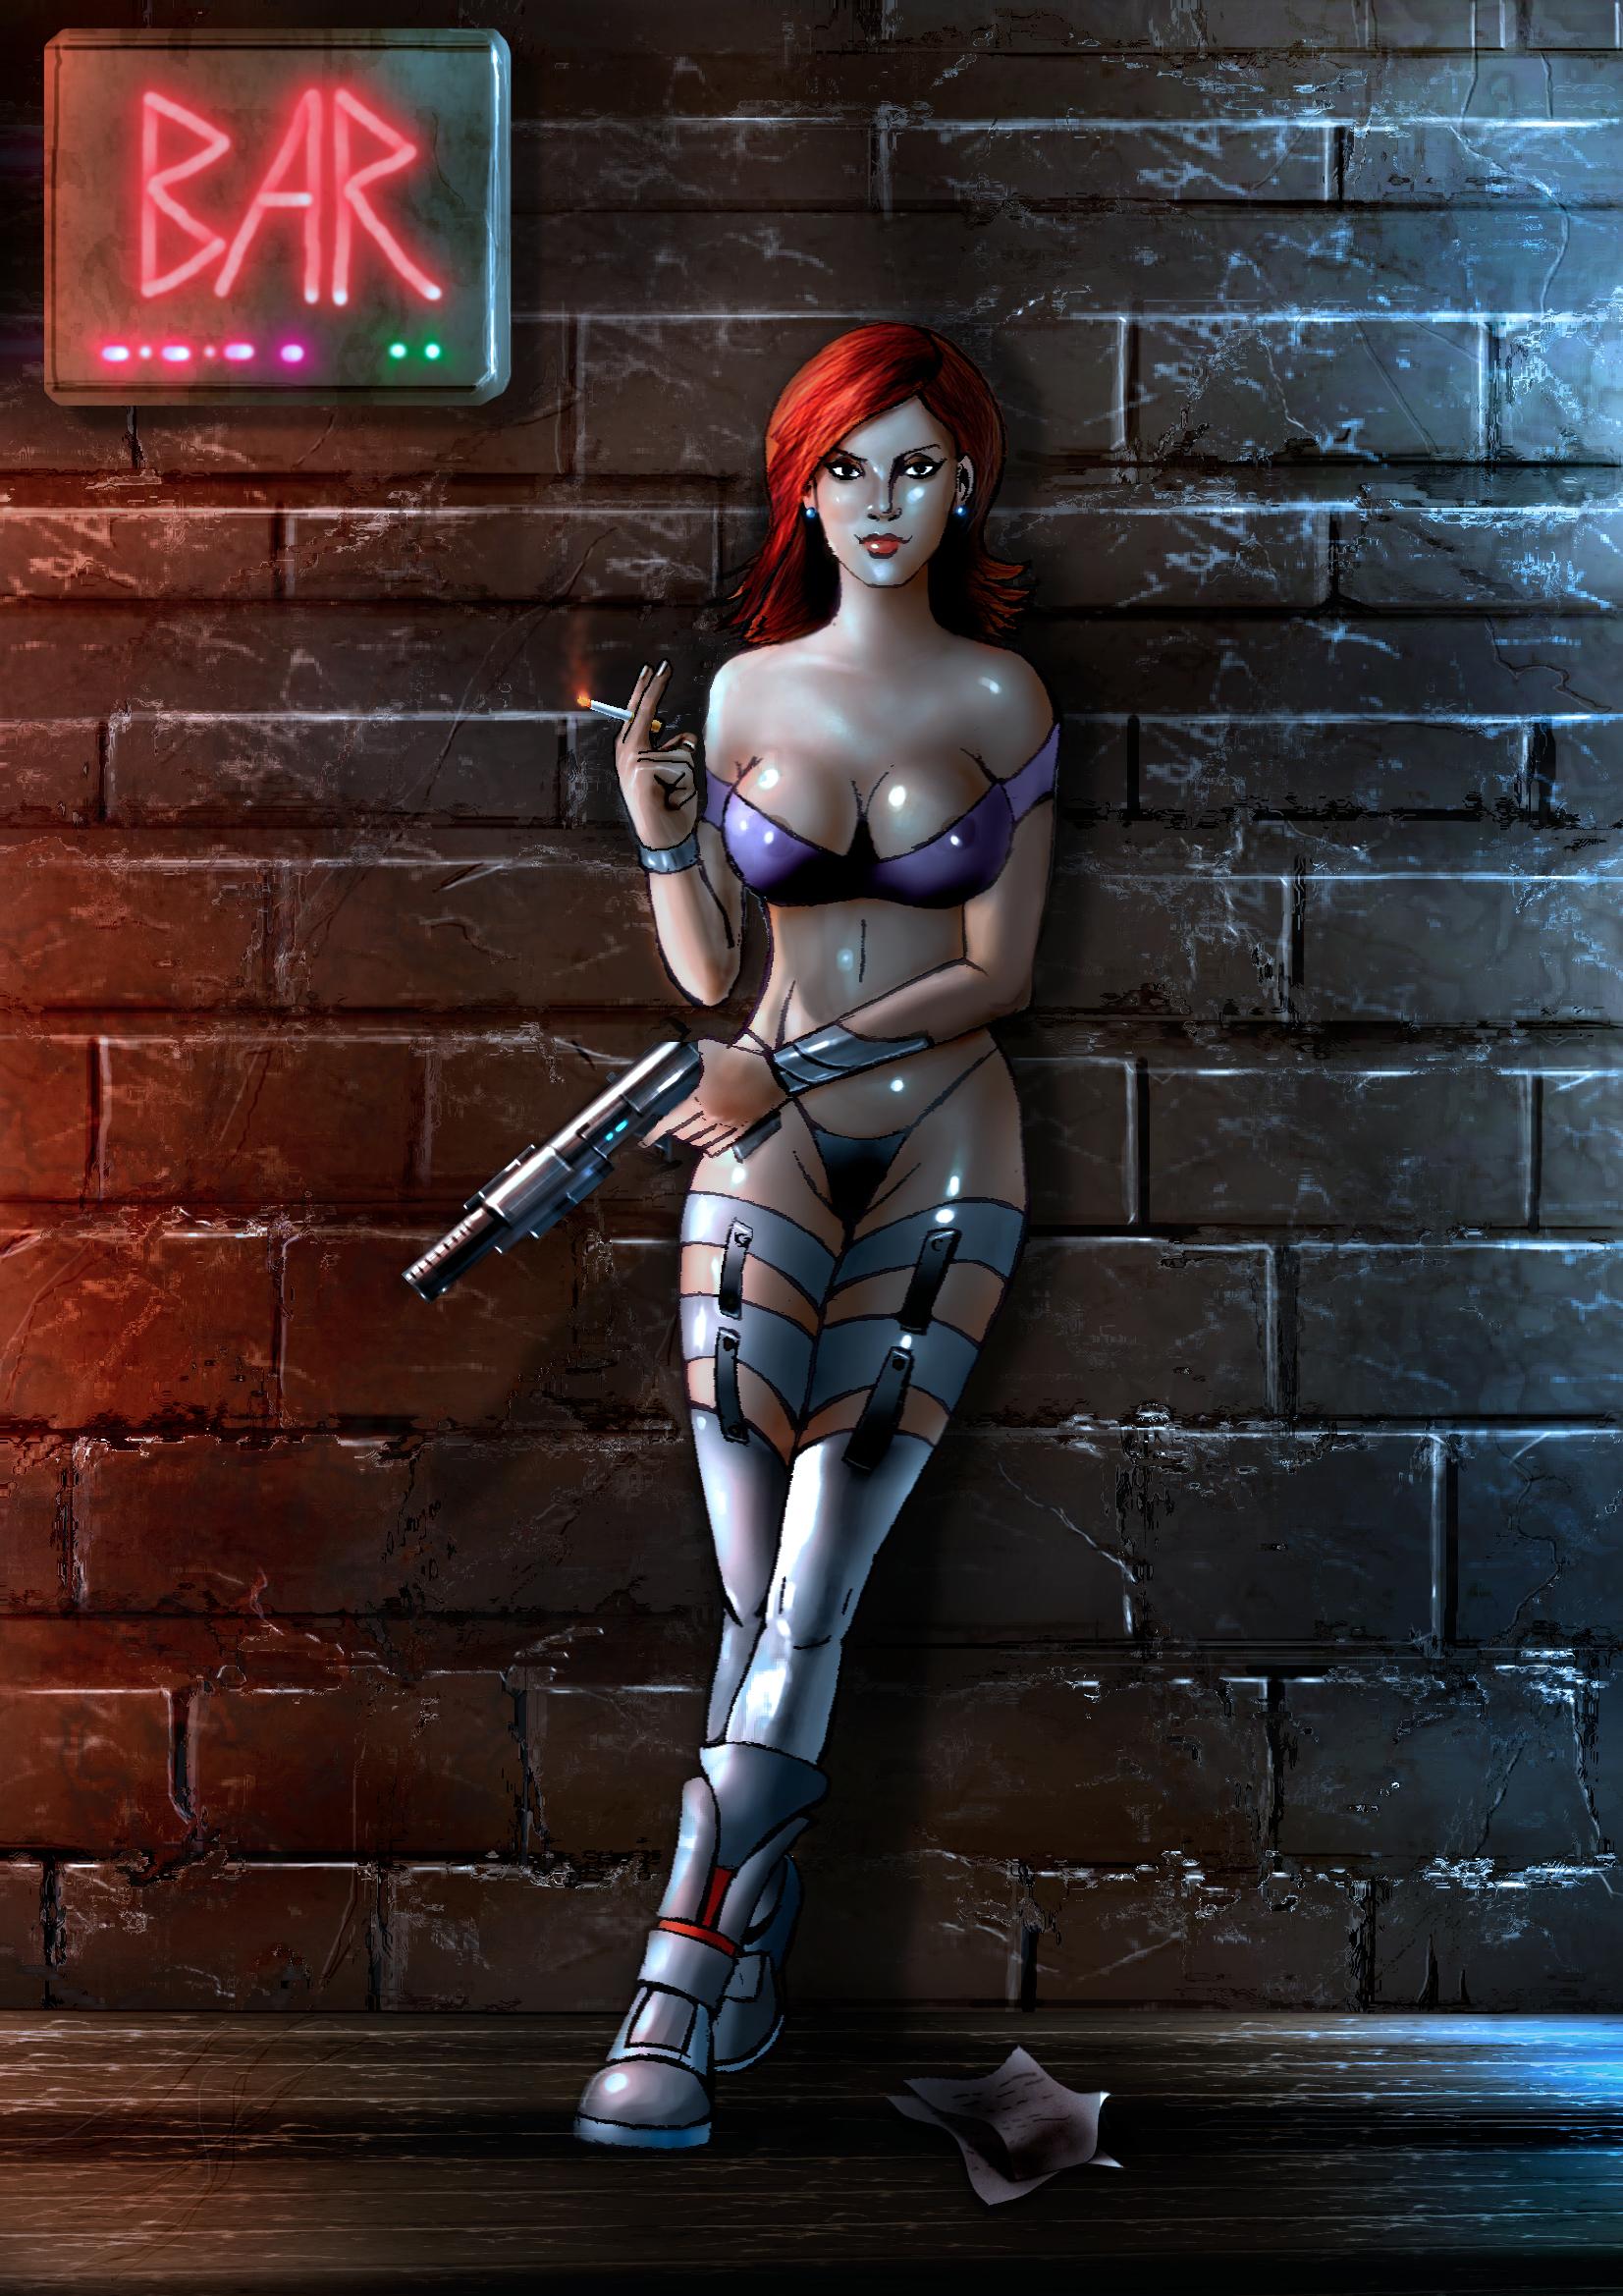 Callgirls carry guns -mouse edition